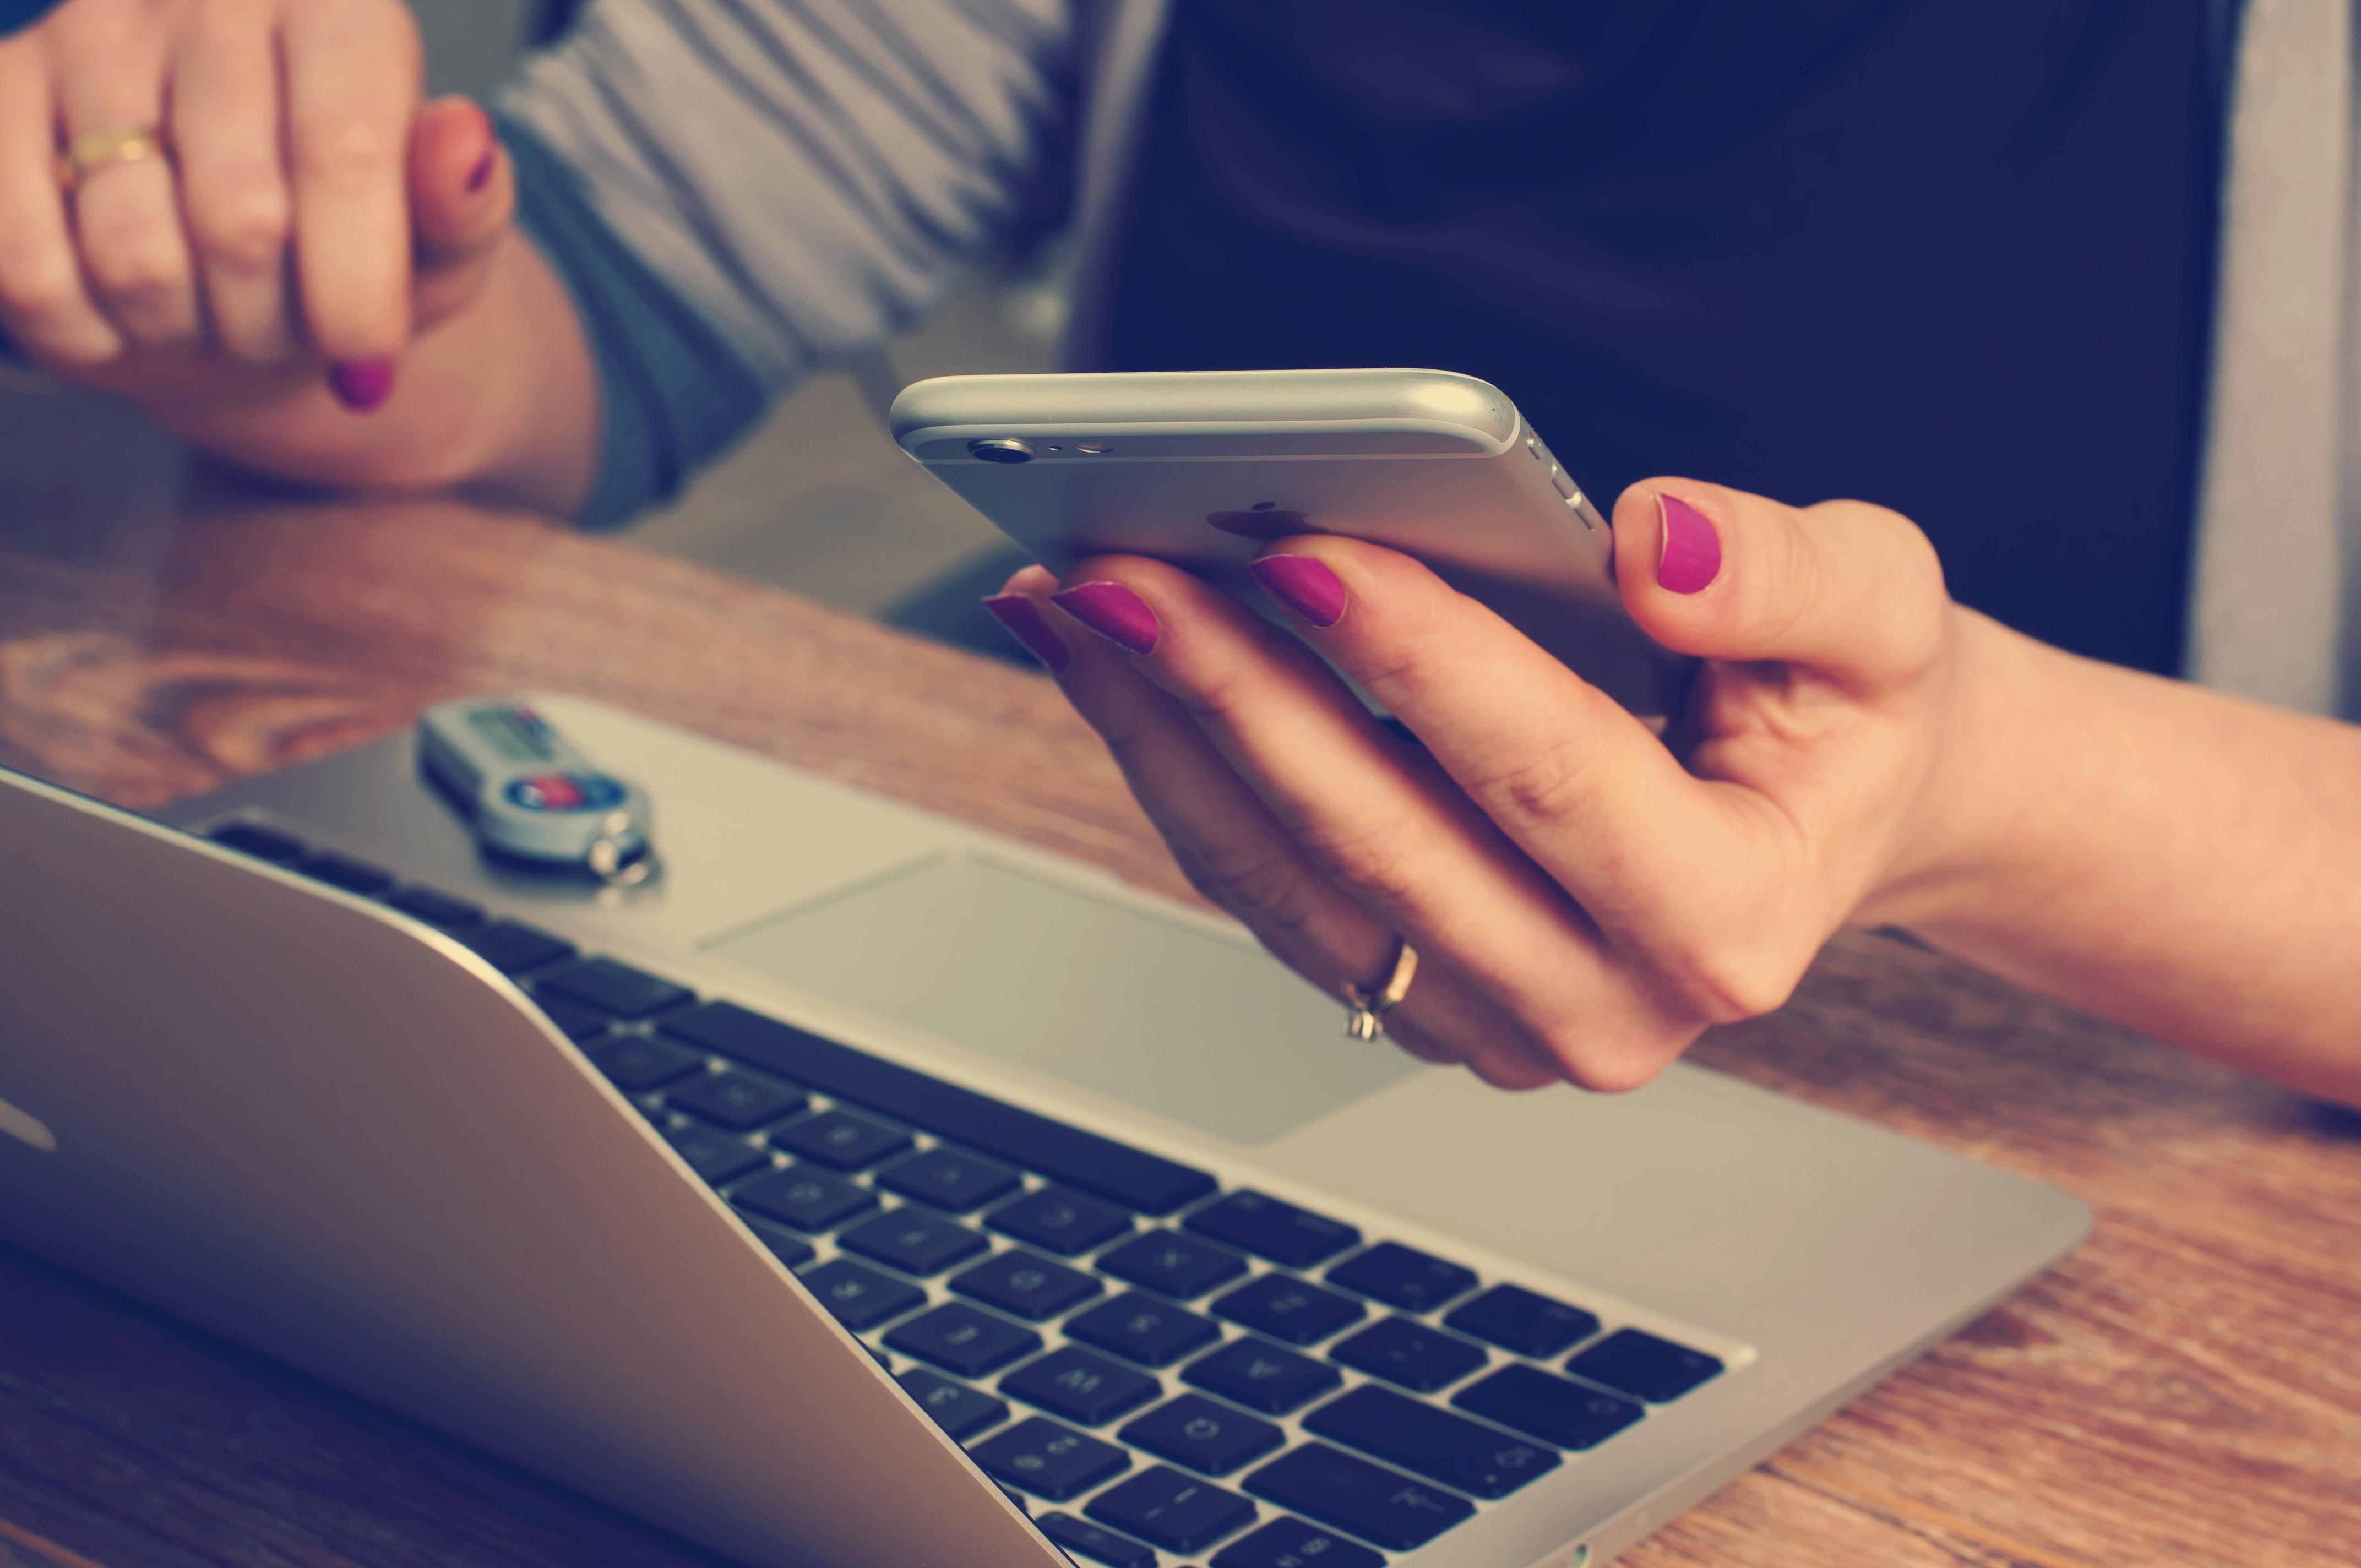 Using neuromarketing to influence digital marketing with photo from Unsplash